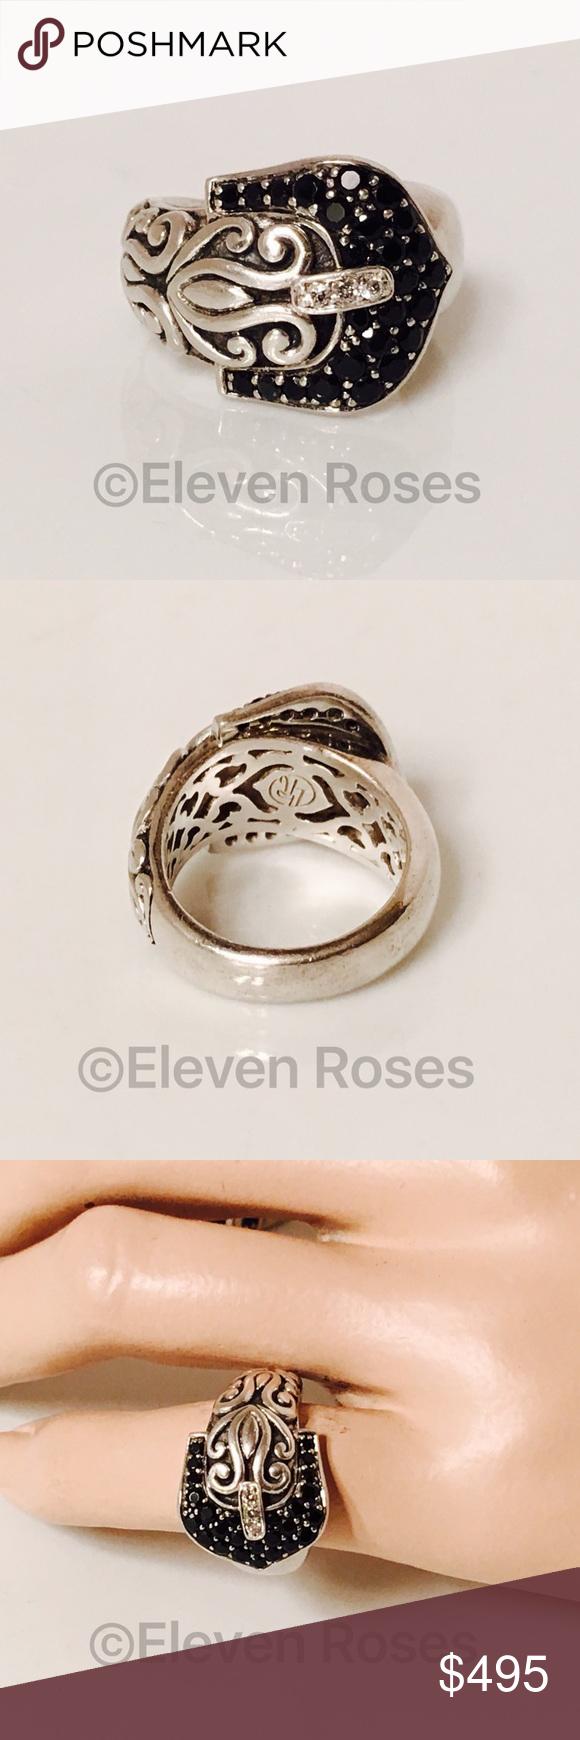 ae93ab078 Yasmin & Jazmin Sapphire Diamond Buckle Ring Yasmin & Jazmin Black Sapphire  & Diamond Buckle Ring - 925 Sterling Silver - Black Sapphire Gemstones -  Diamond ...